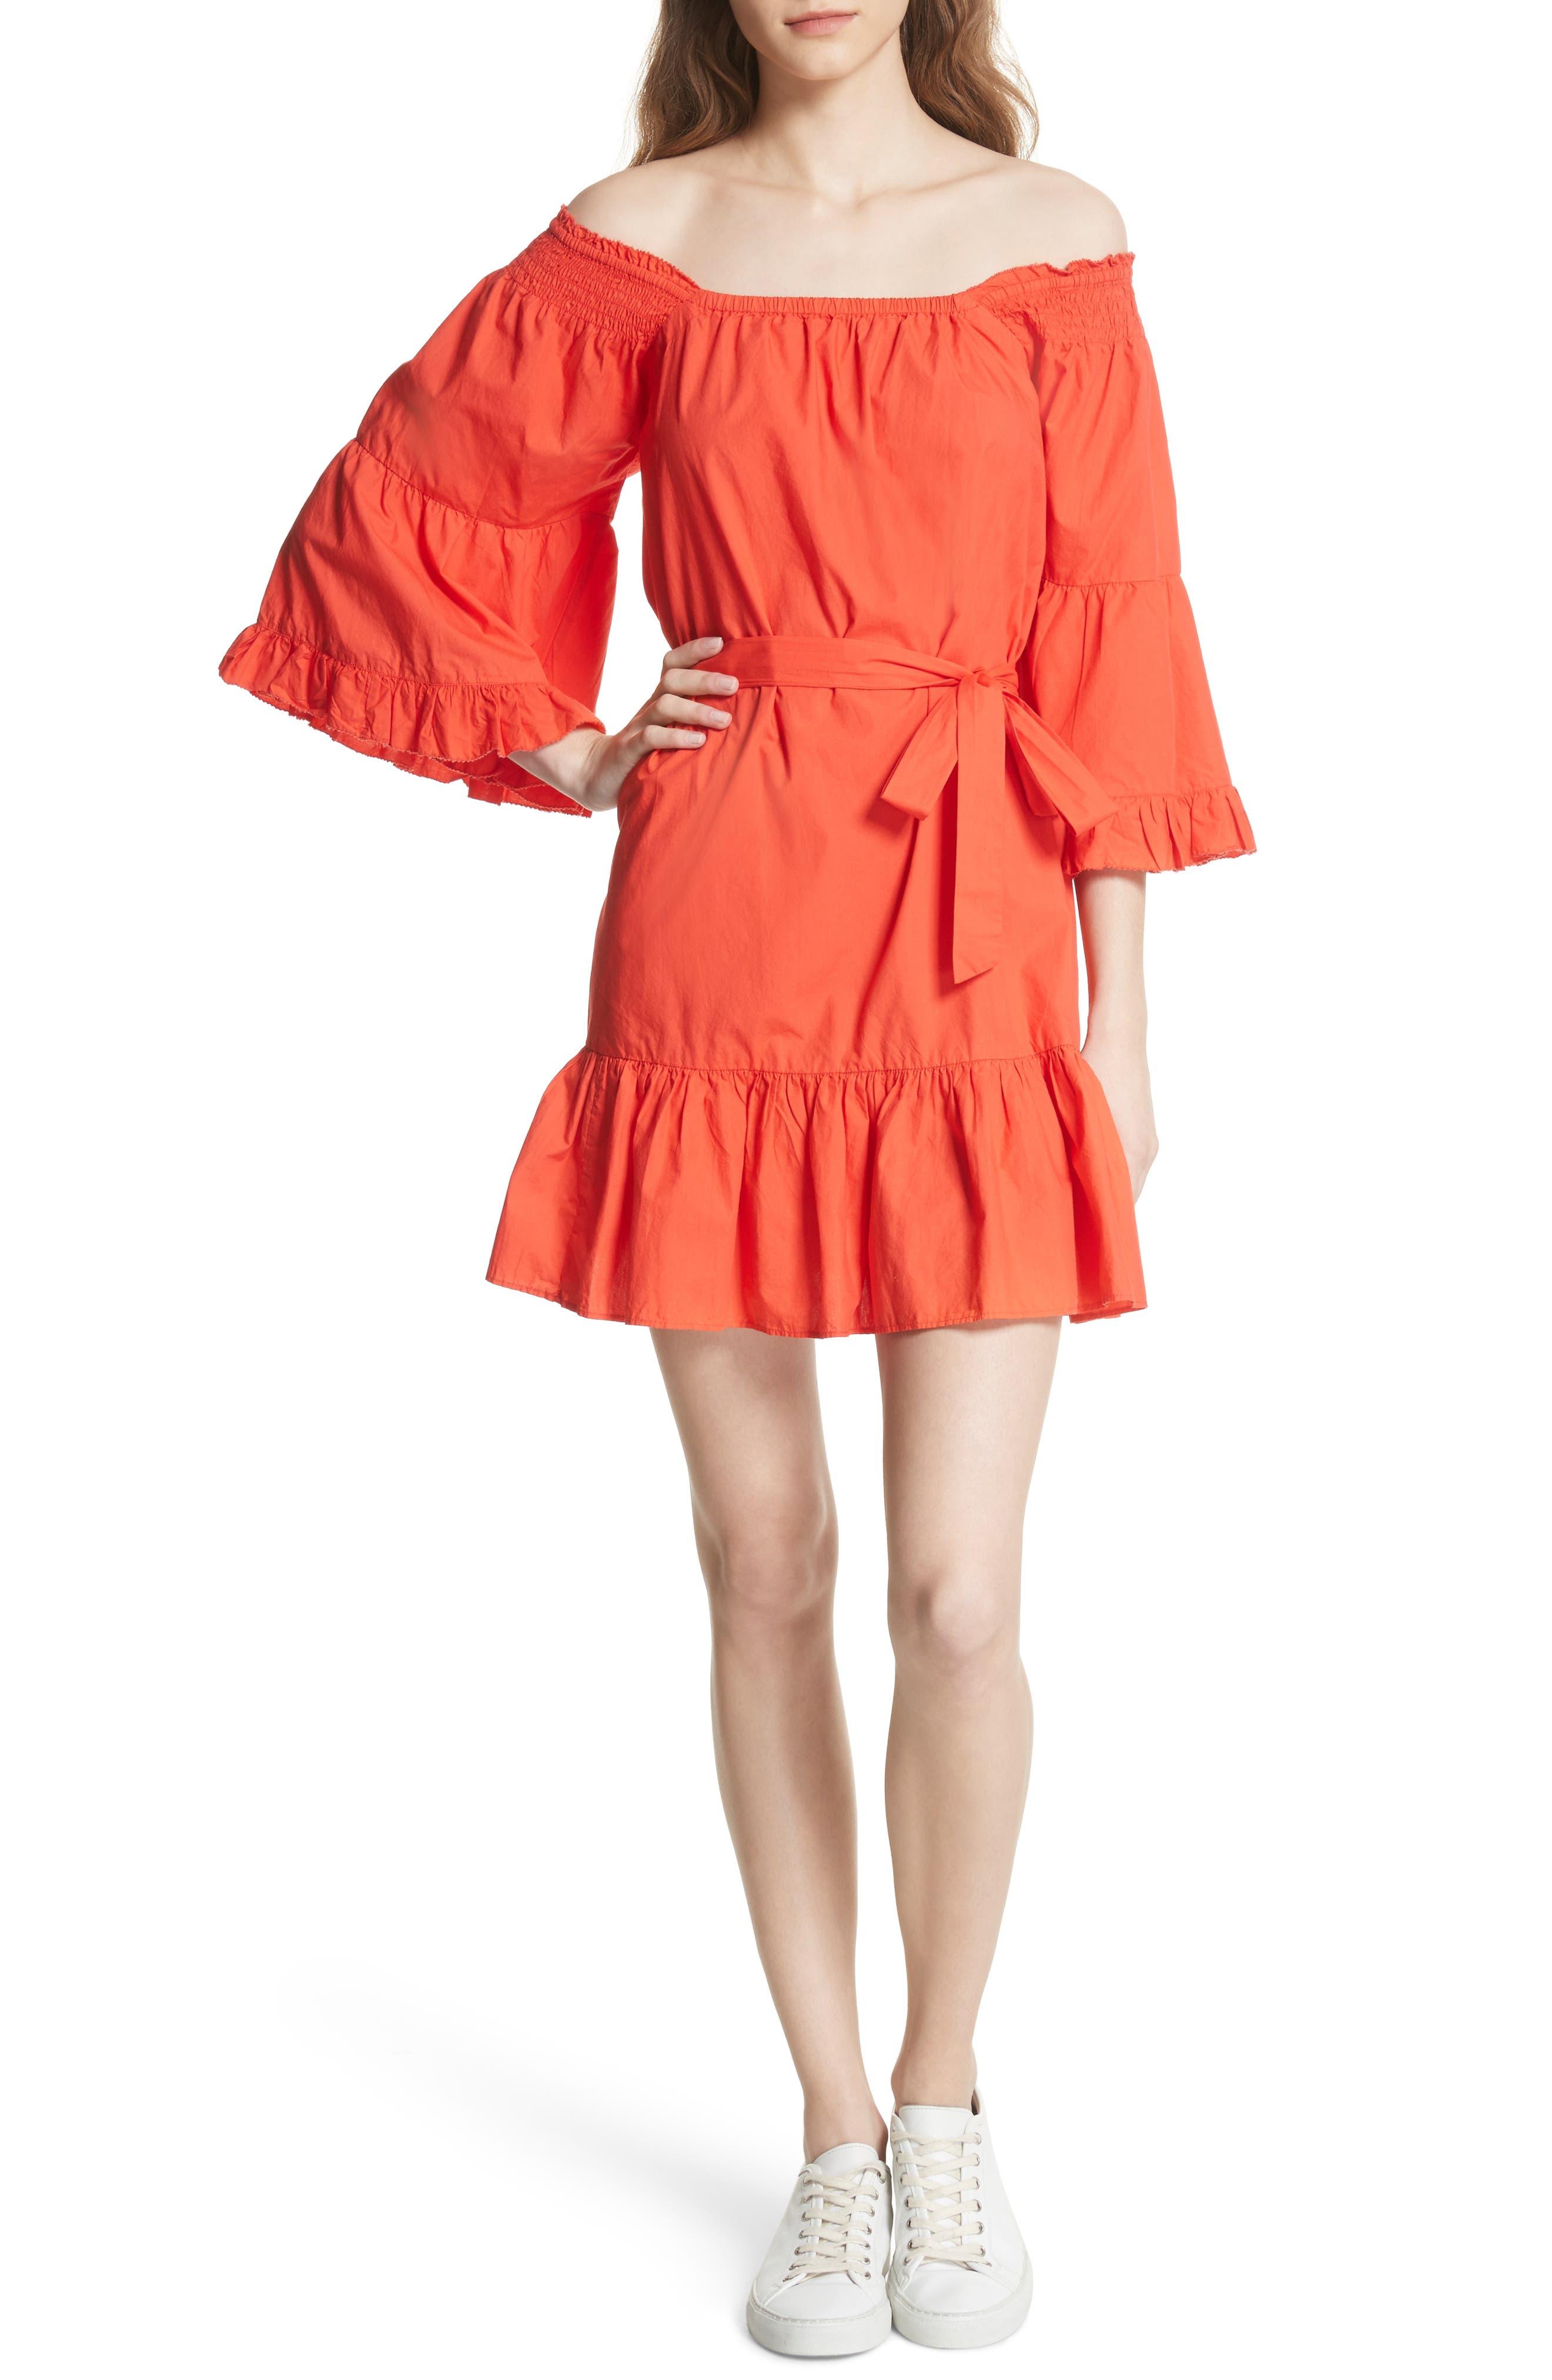 Colstona Ruffle Cotton Dress,                             Main thumbnail 1, color,                             800